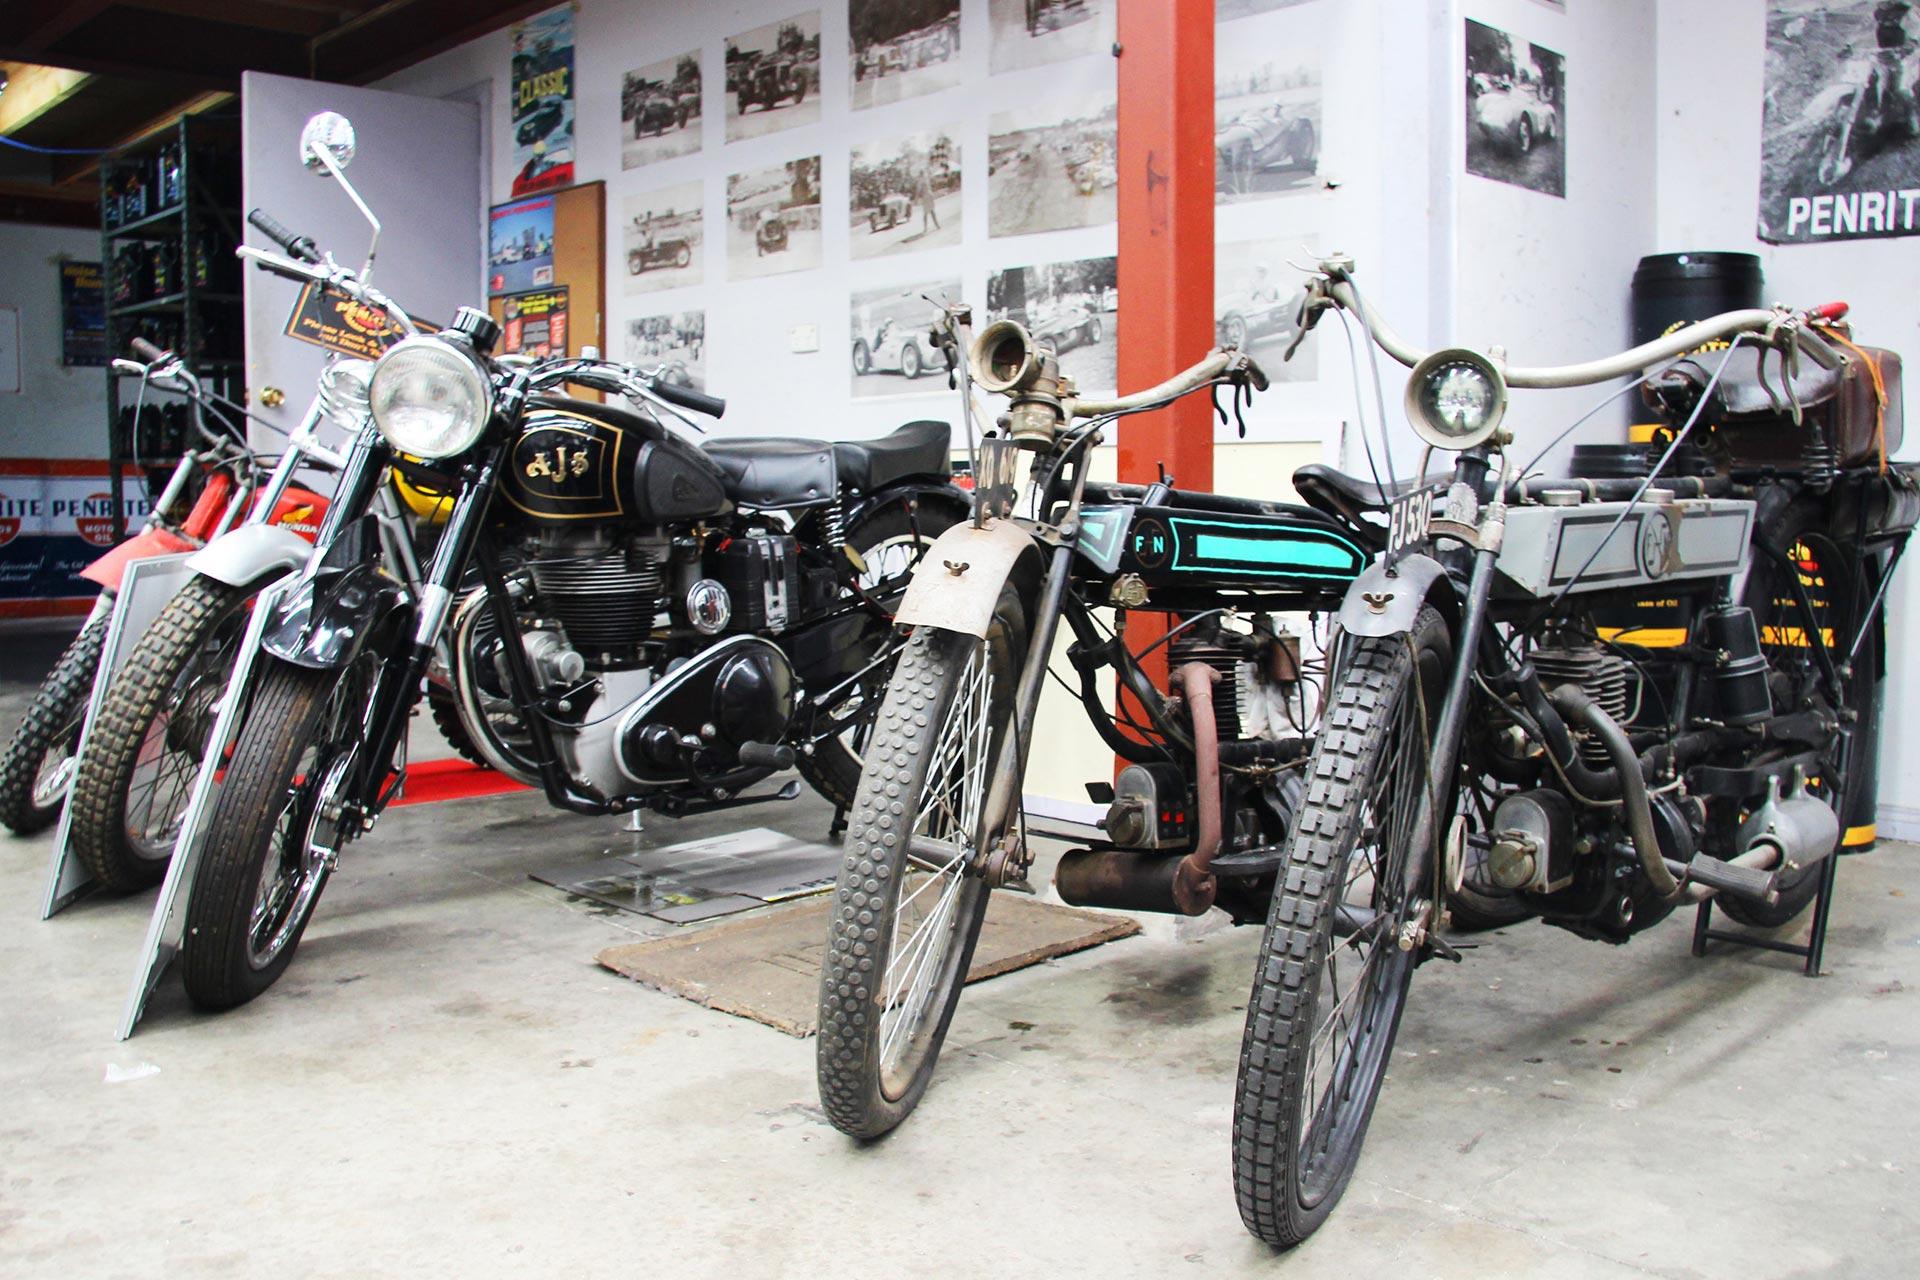 Broadford Bike Bonanza